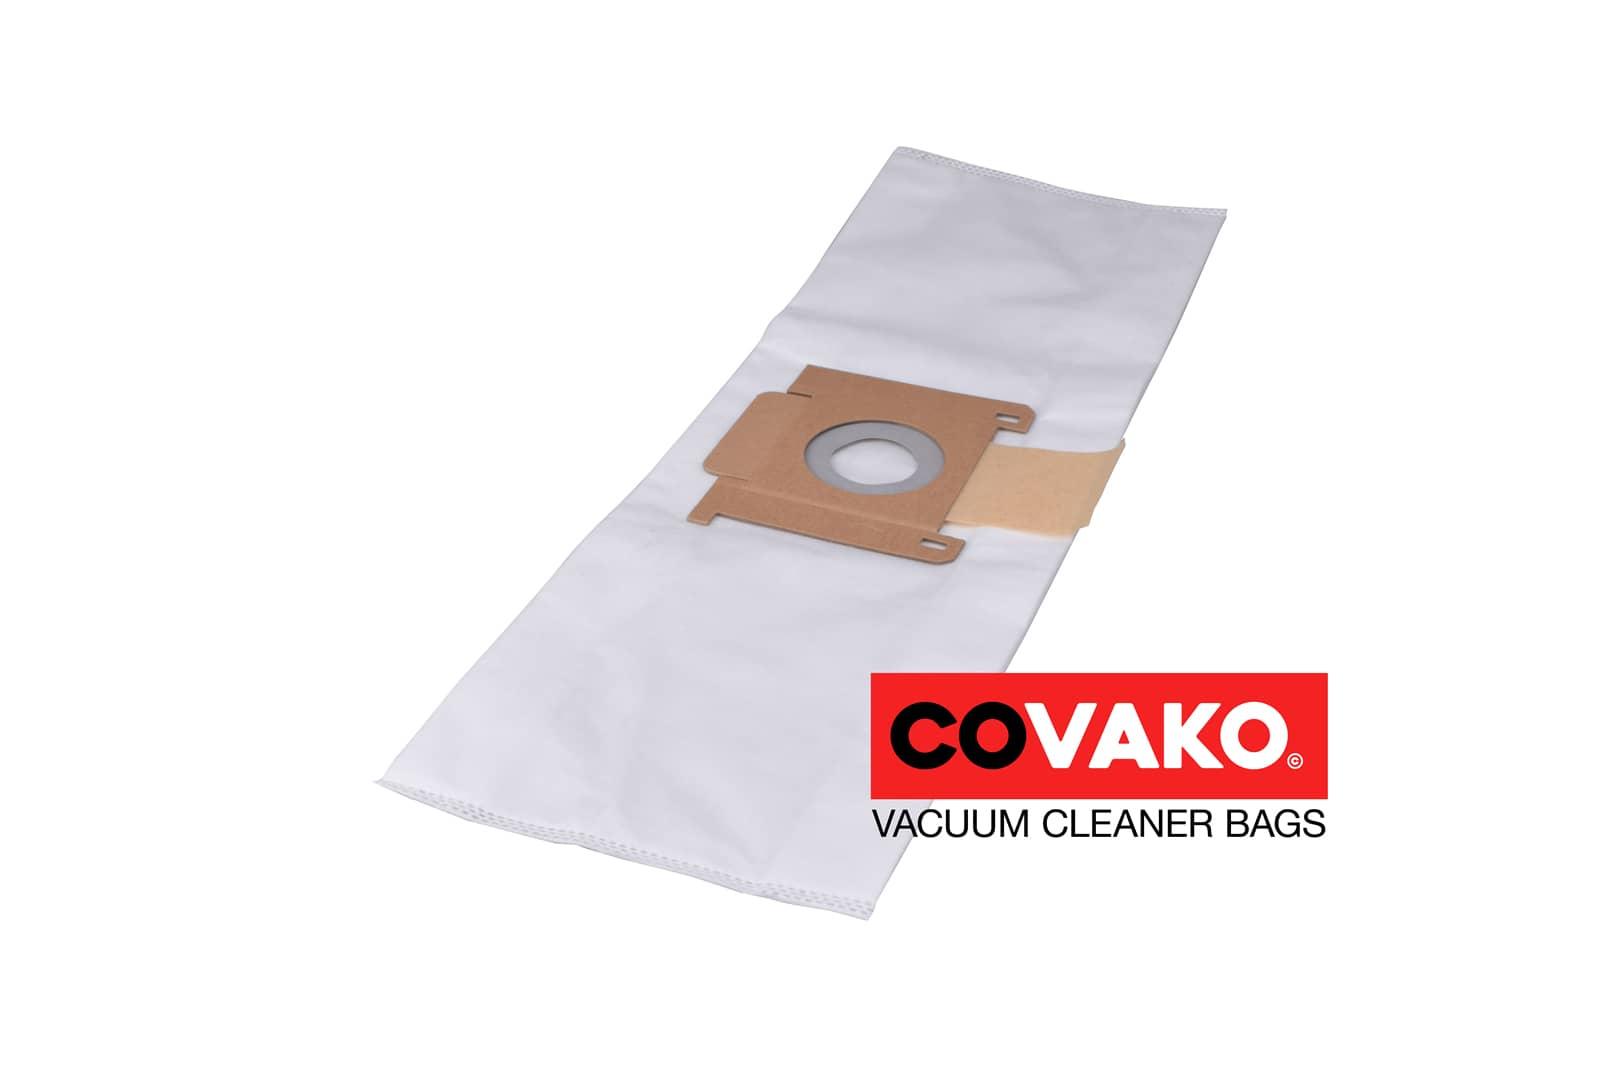 Kenter pur Q / Synthesis - Kenter vacuum cleaner bags